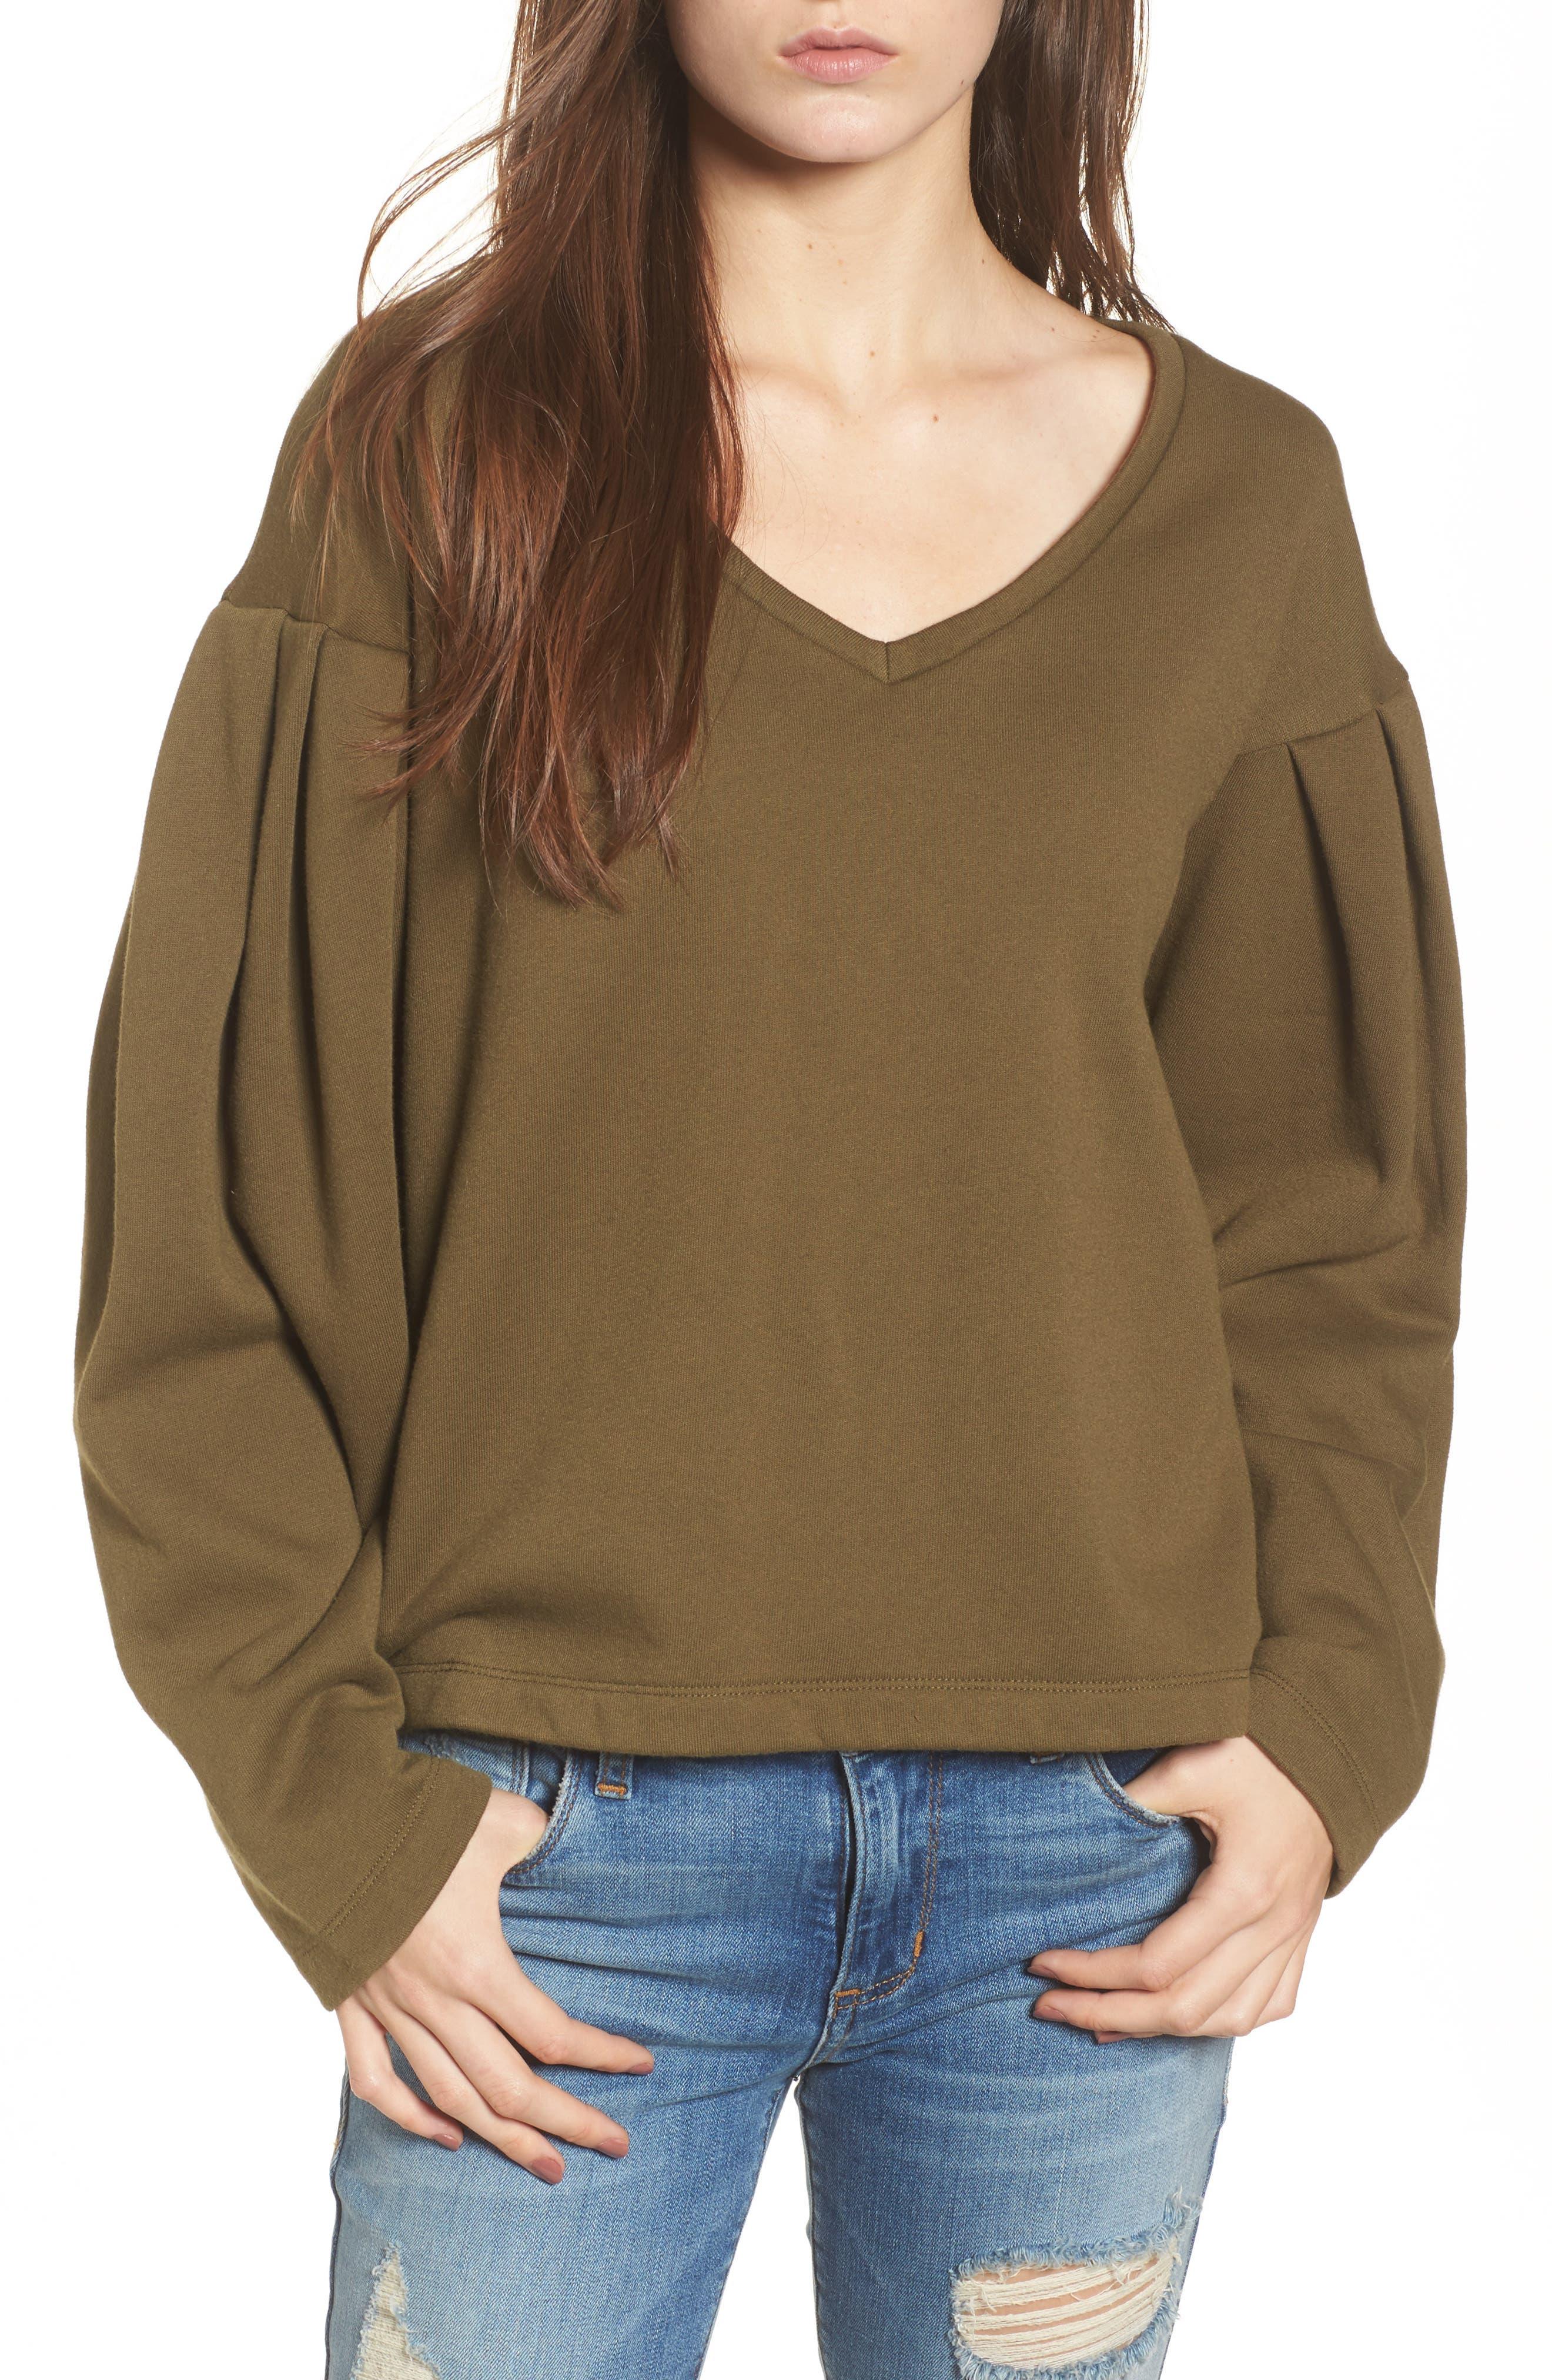 Alternate Image 1 Selected - BP. Pleat Sleeve Sweater